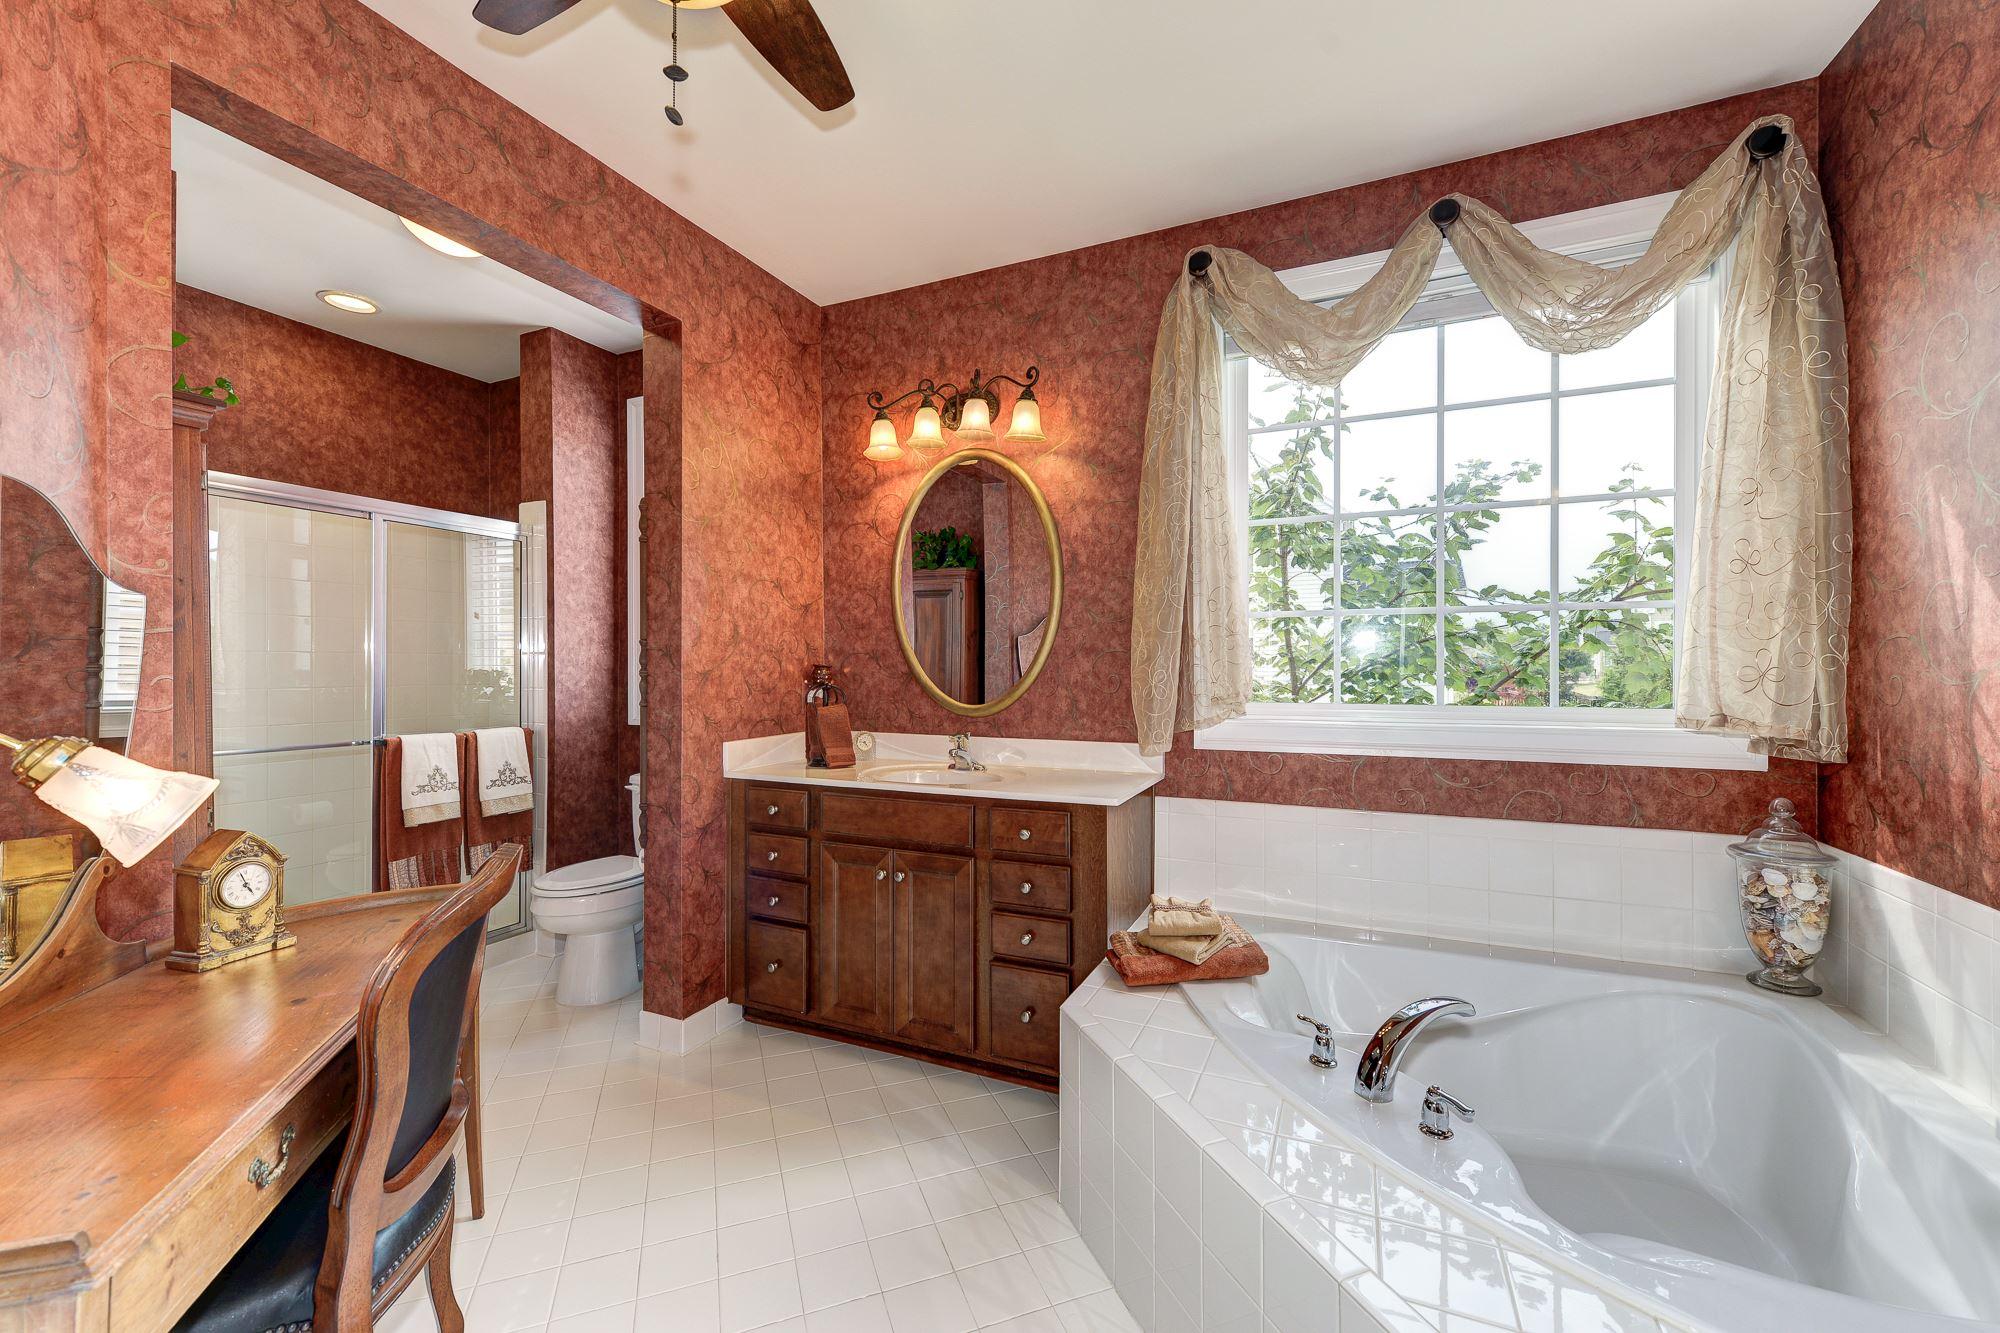 ... Master Suite W/2 Walk In Closets, 9u0027 Ceilings Throughout, Hardwood  Floors, Crown Molding,gourmet Kitchen, Media/theatre Room, Wet Bar, Great  Storage